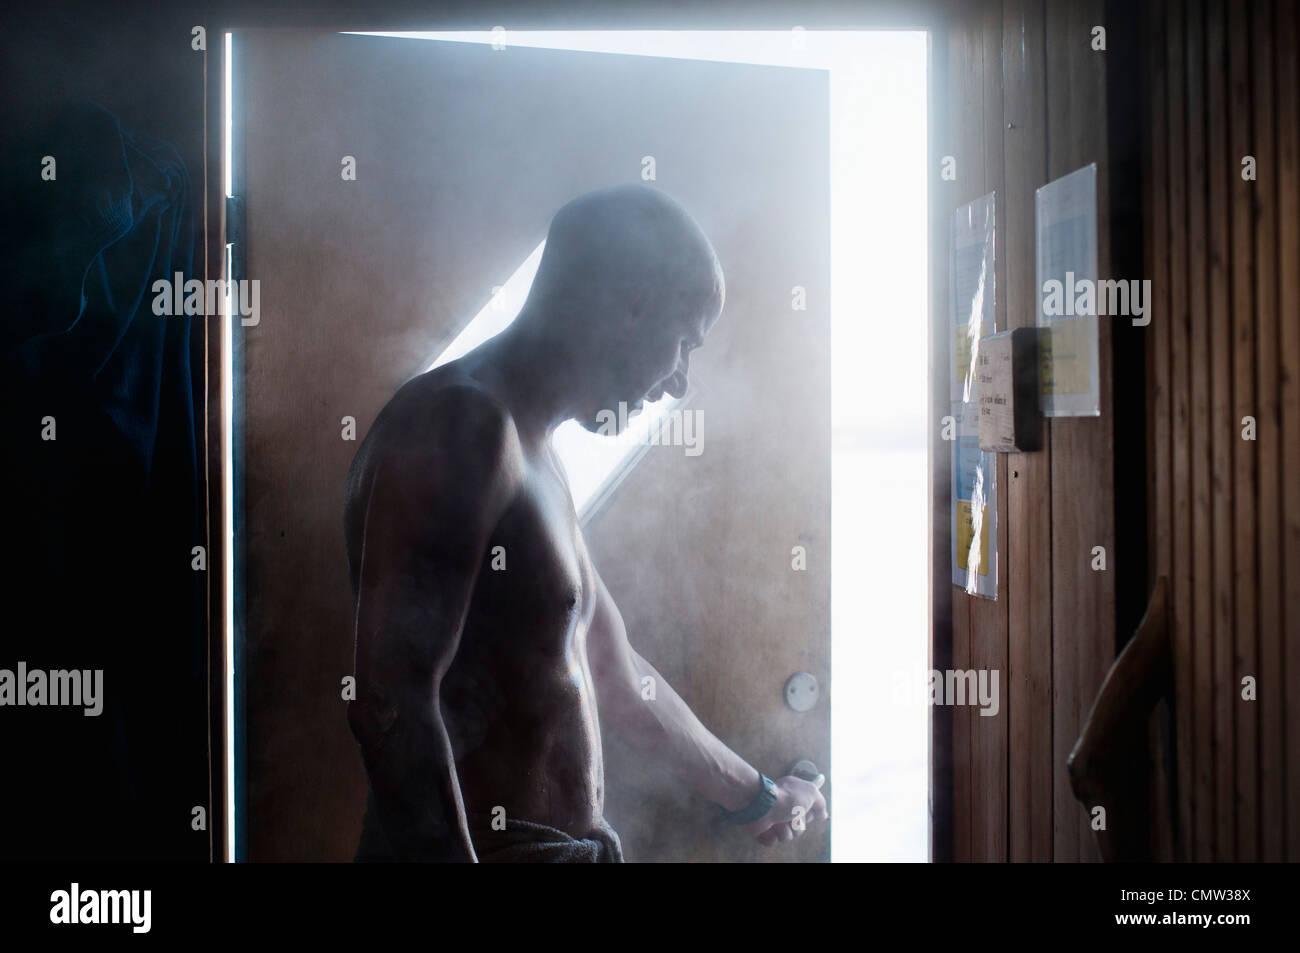 Man entering sauna - Stock Image